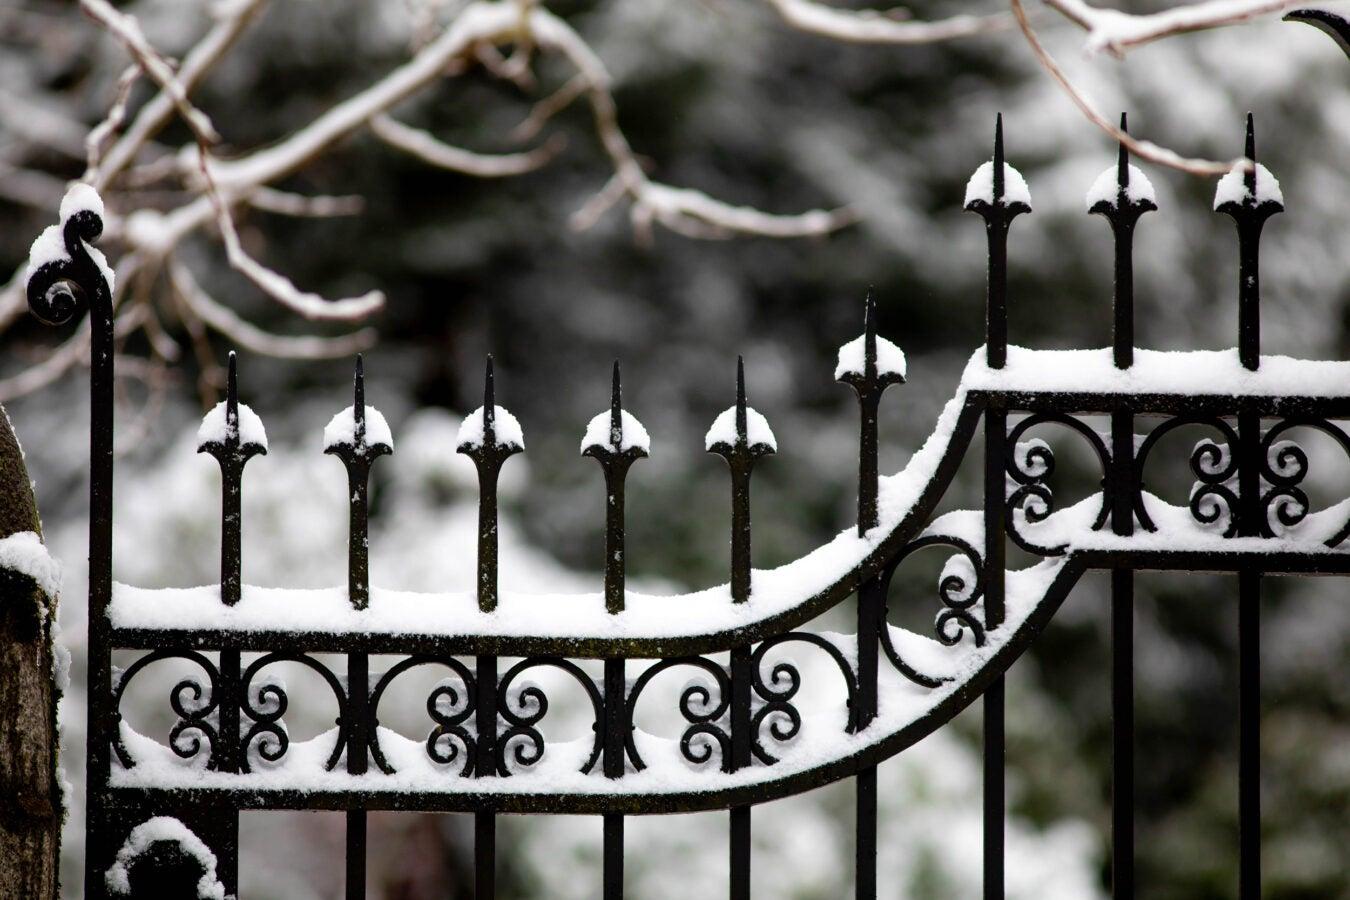 Snow blankets the Washington Street Gate.